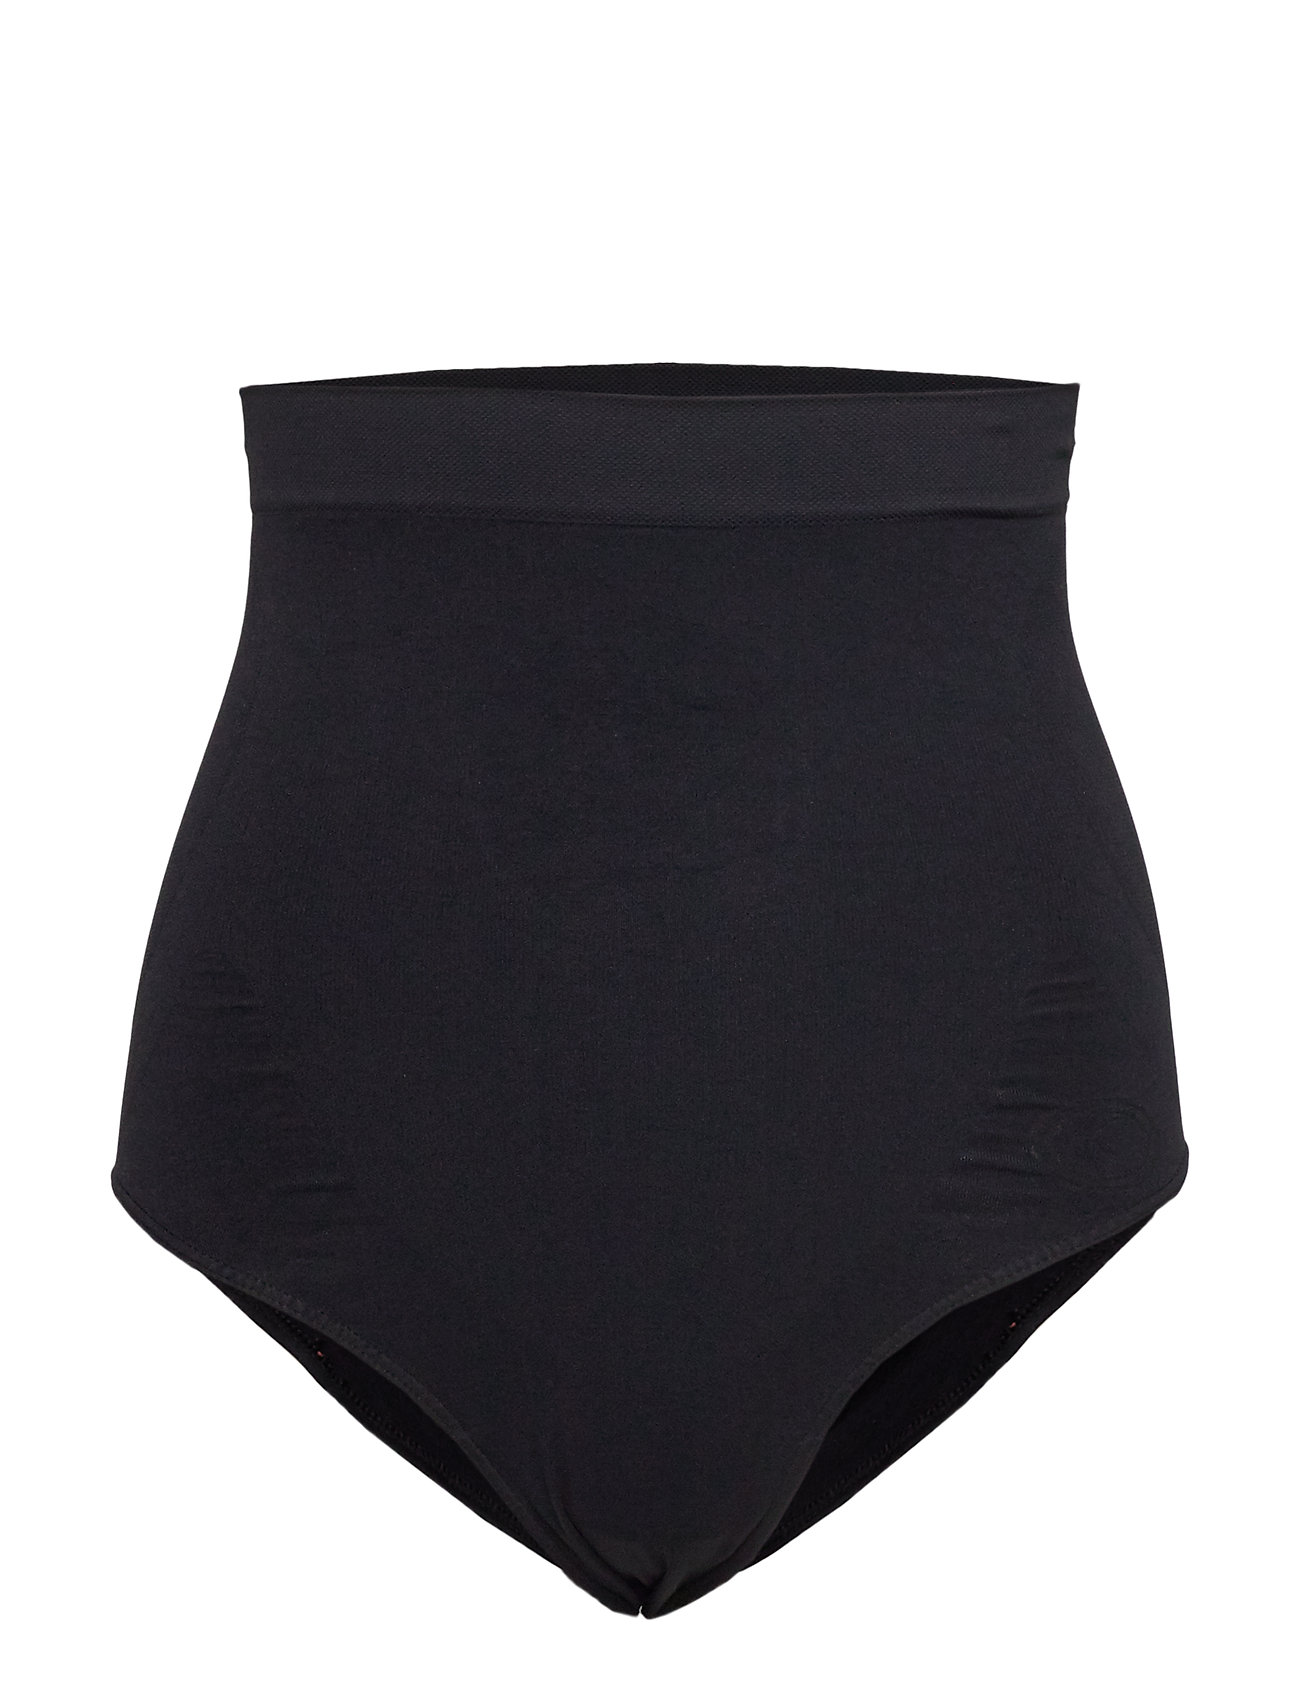 Decoy Shapewear tai high waist - BLACK